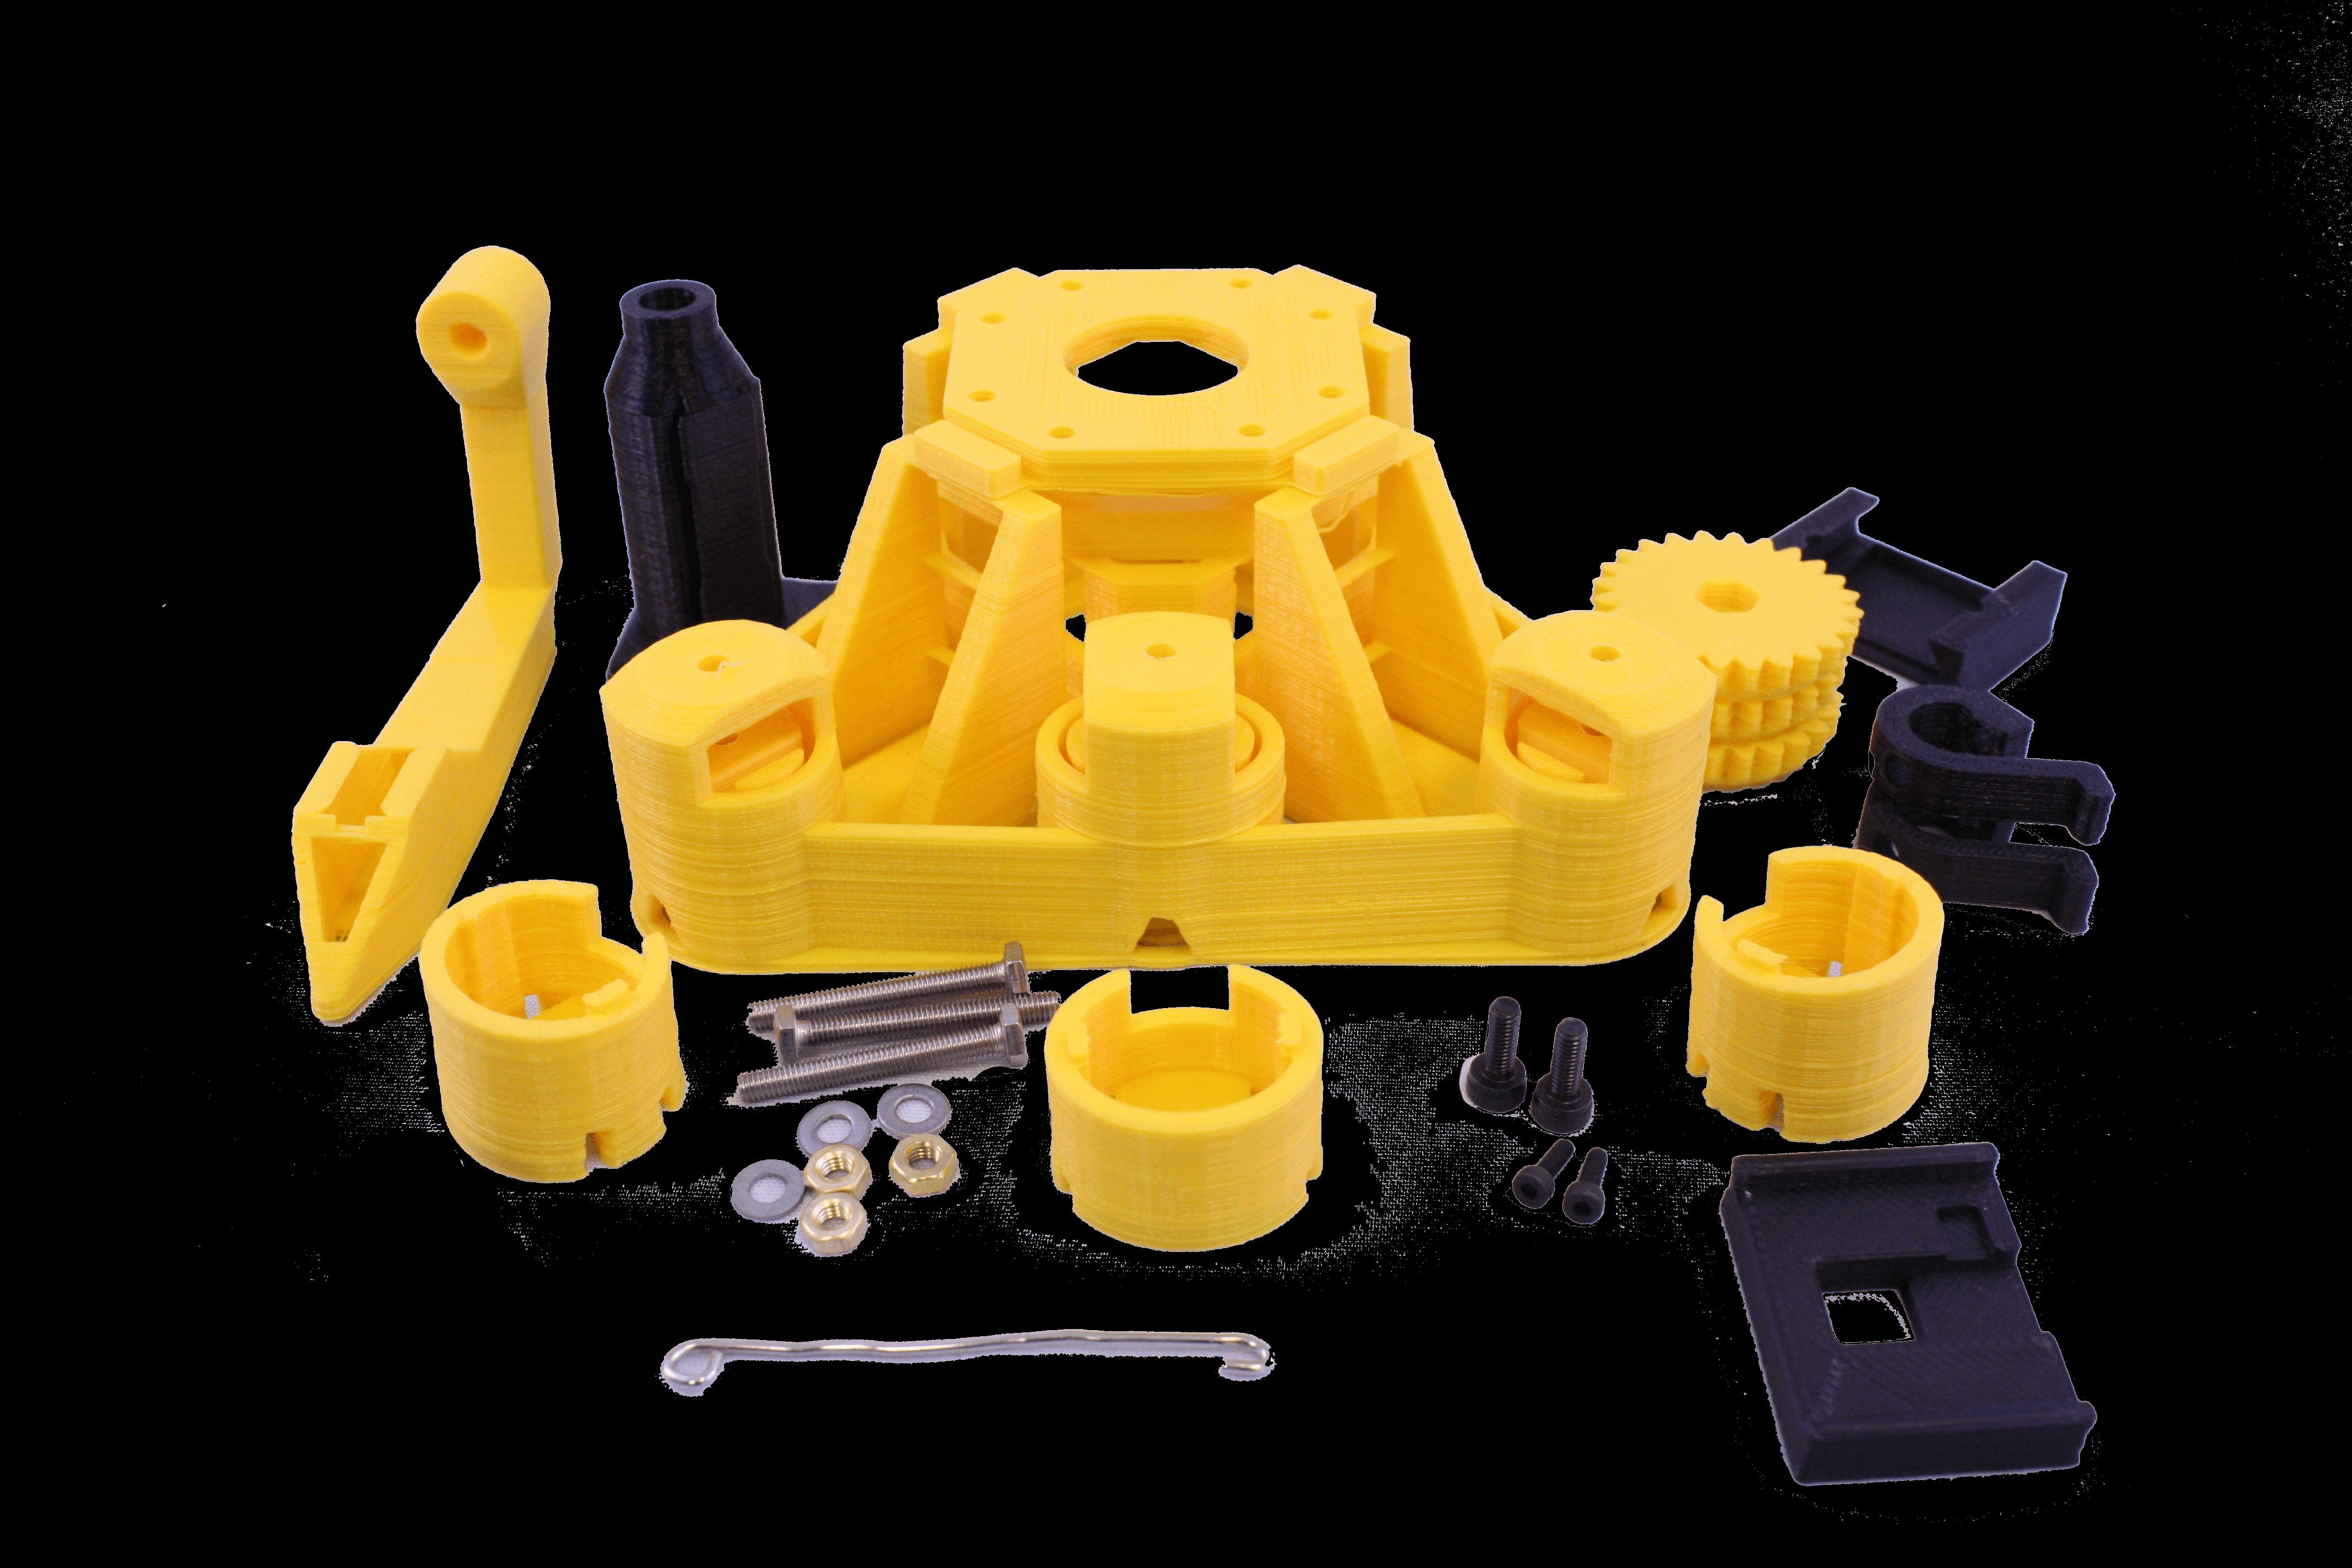 waterscope yellow microscope parts